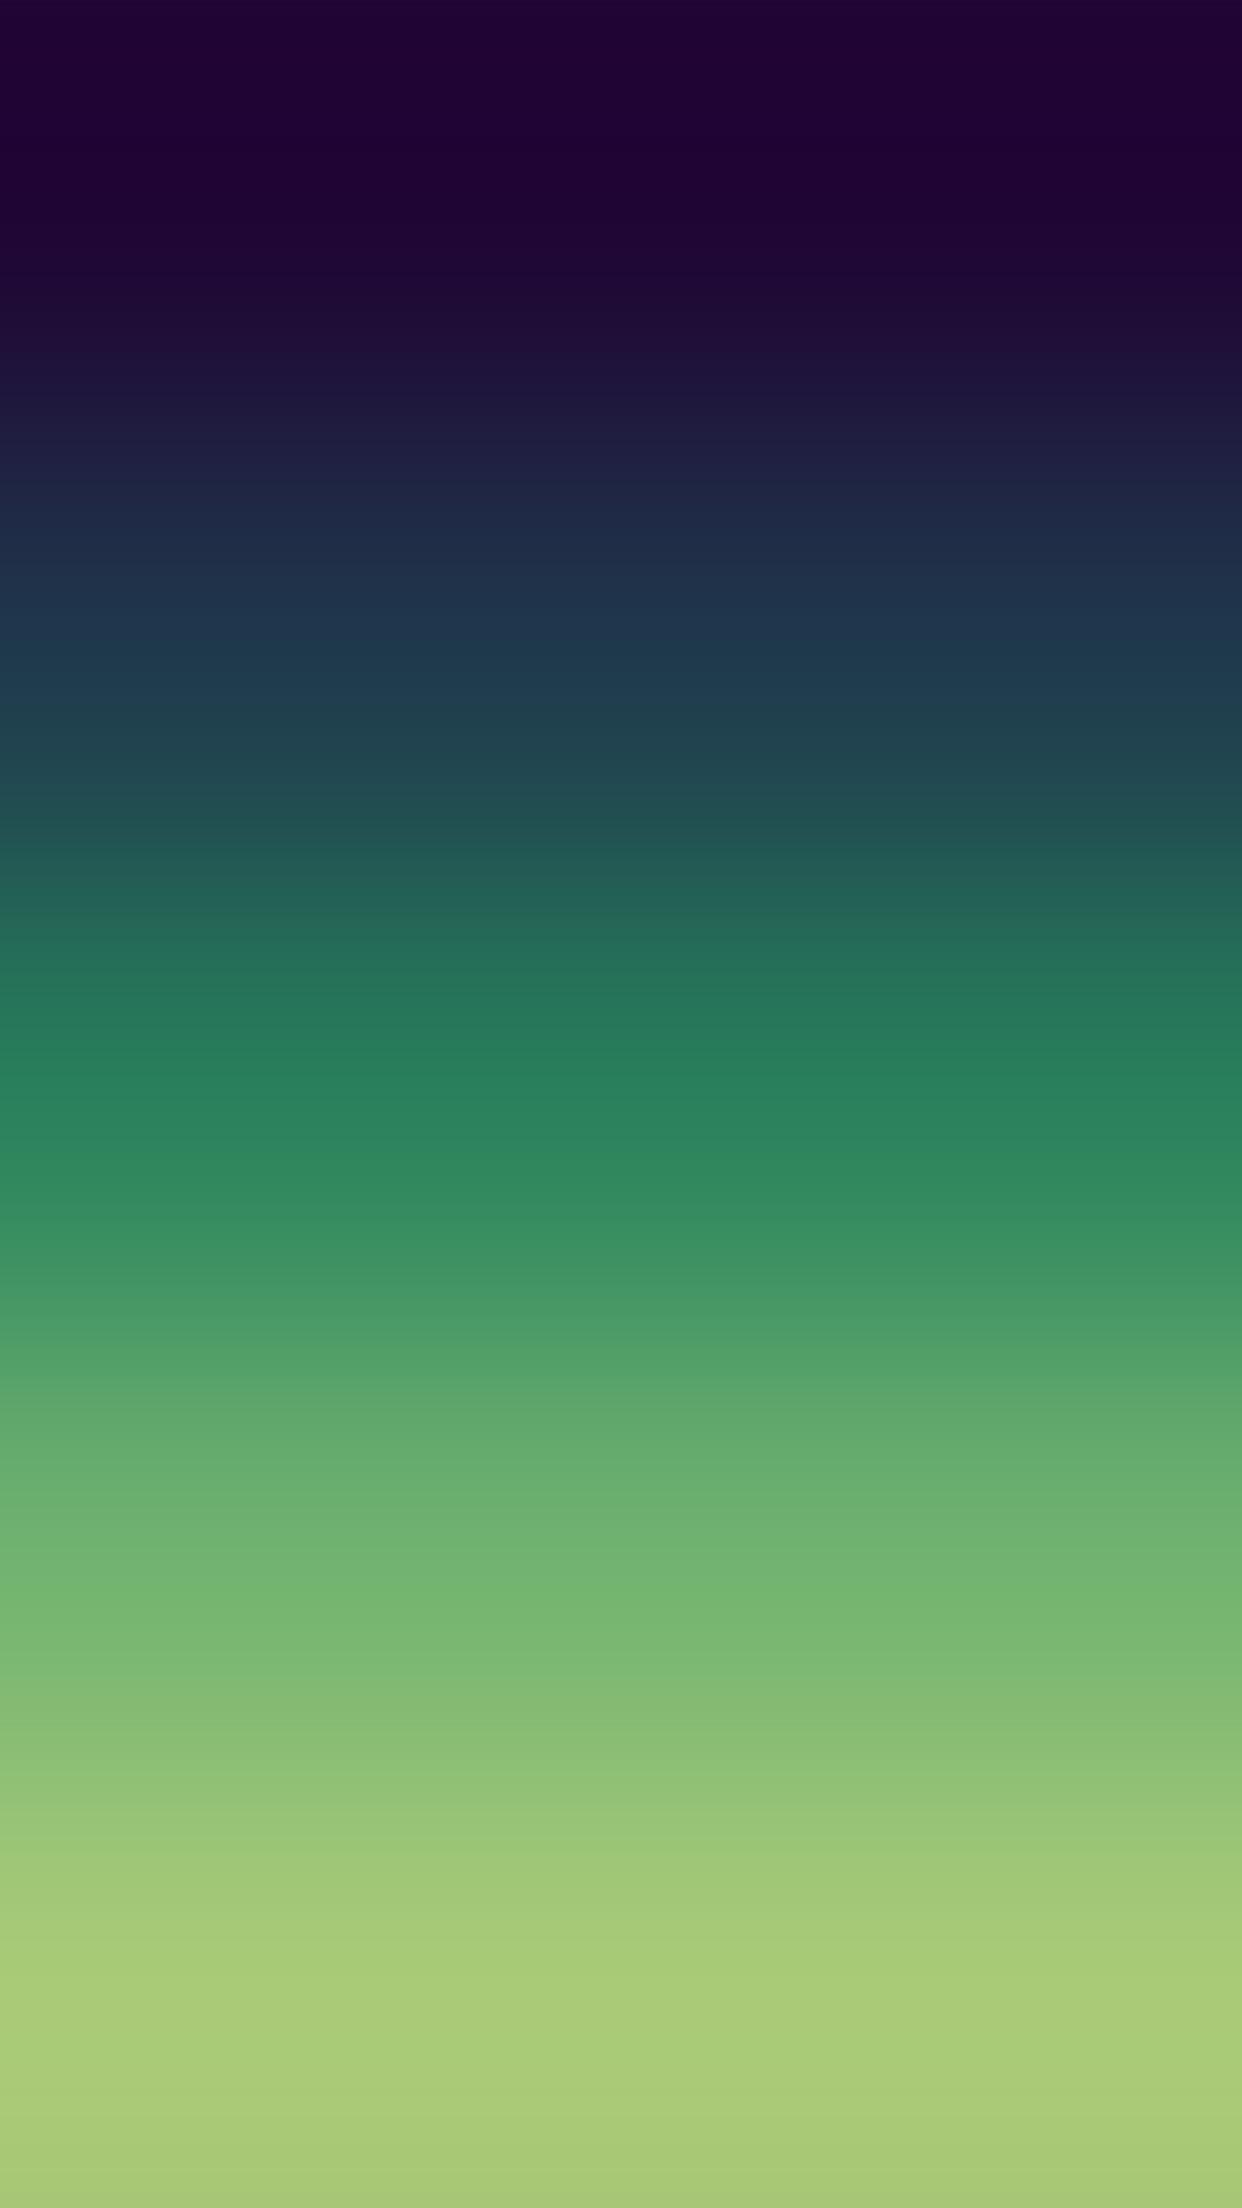 Blue Green Yellow Iphone 1242x2208 Wallpaper Teahub Io